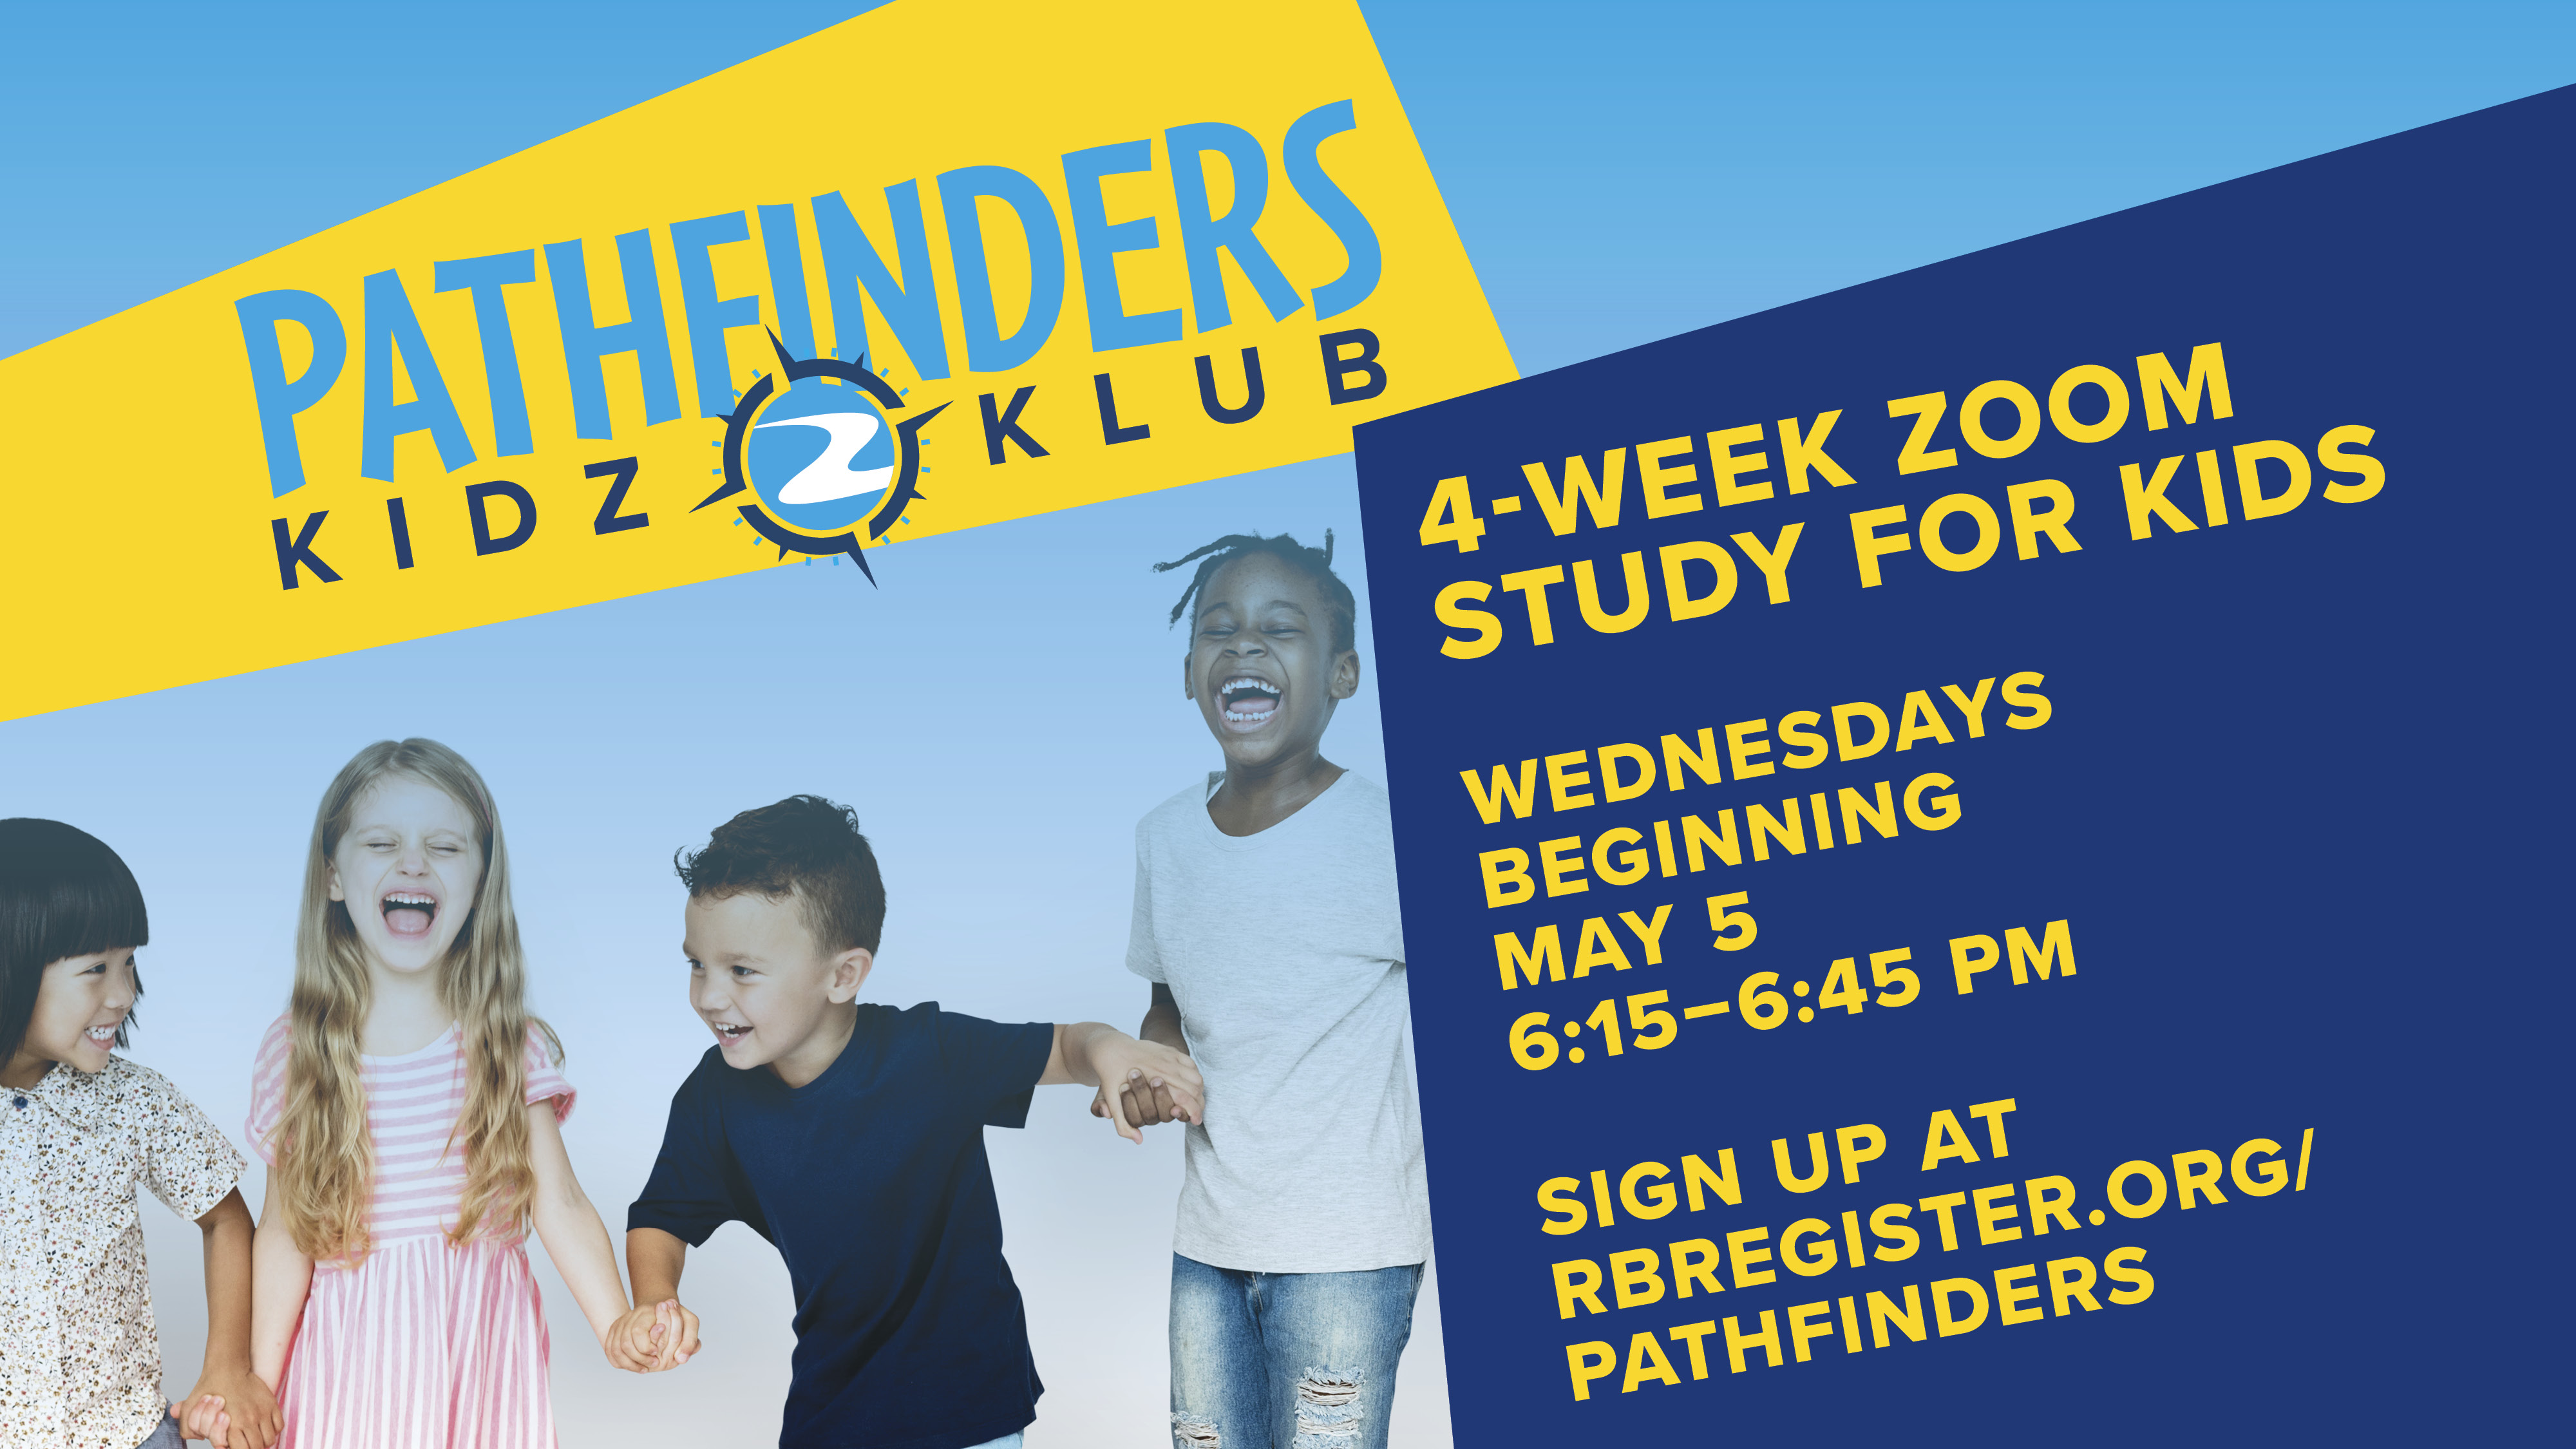 Pathfinders Kidz Klub  Zoom Study